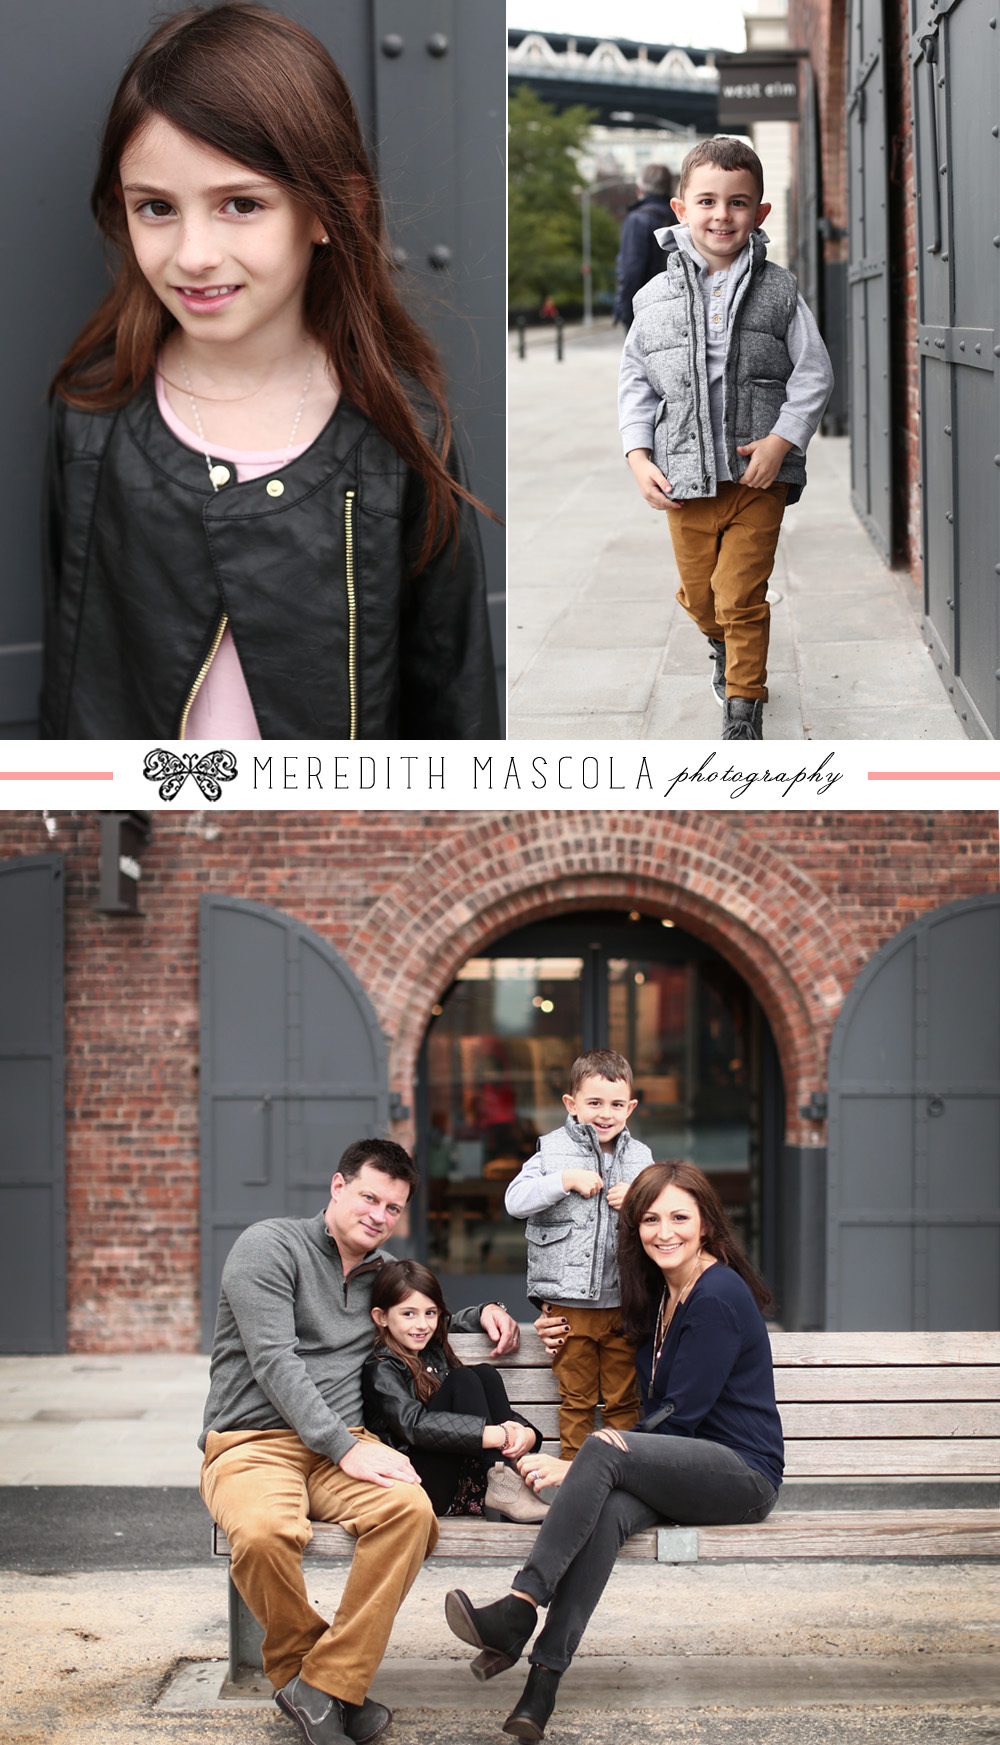 manhattanfamilyphotographer7.jpg